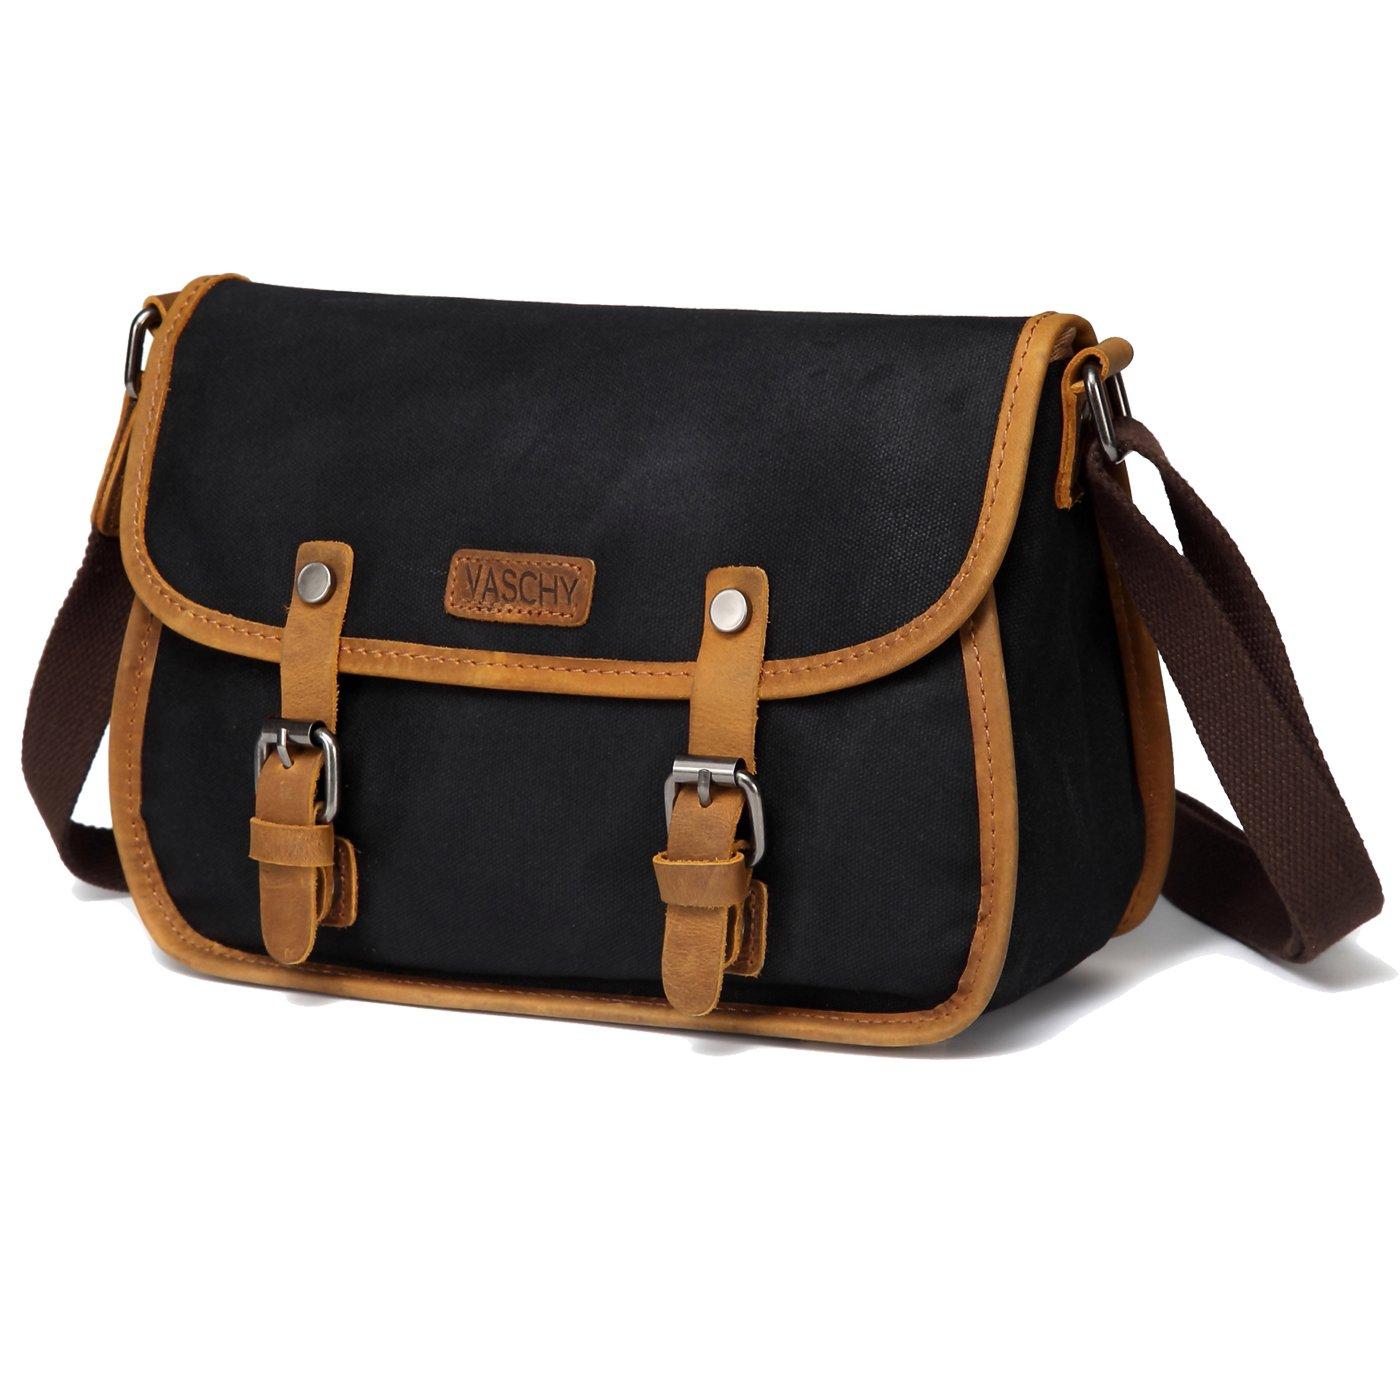 e661dd0124688 Crossbody Bag for Women, VASCHY Vintage Leather Waxed Canvas Flap Small  Shoulder Bag for Women Black: Handbags: Amazon.com